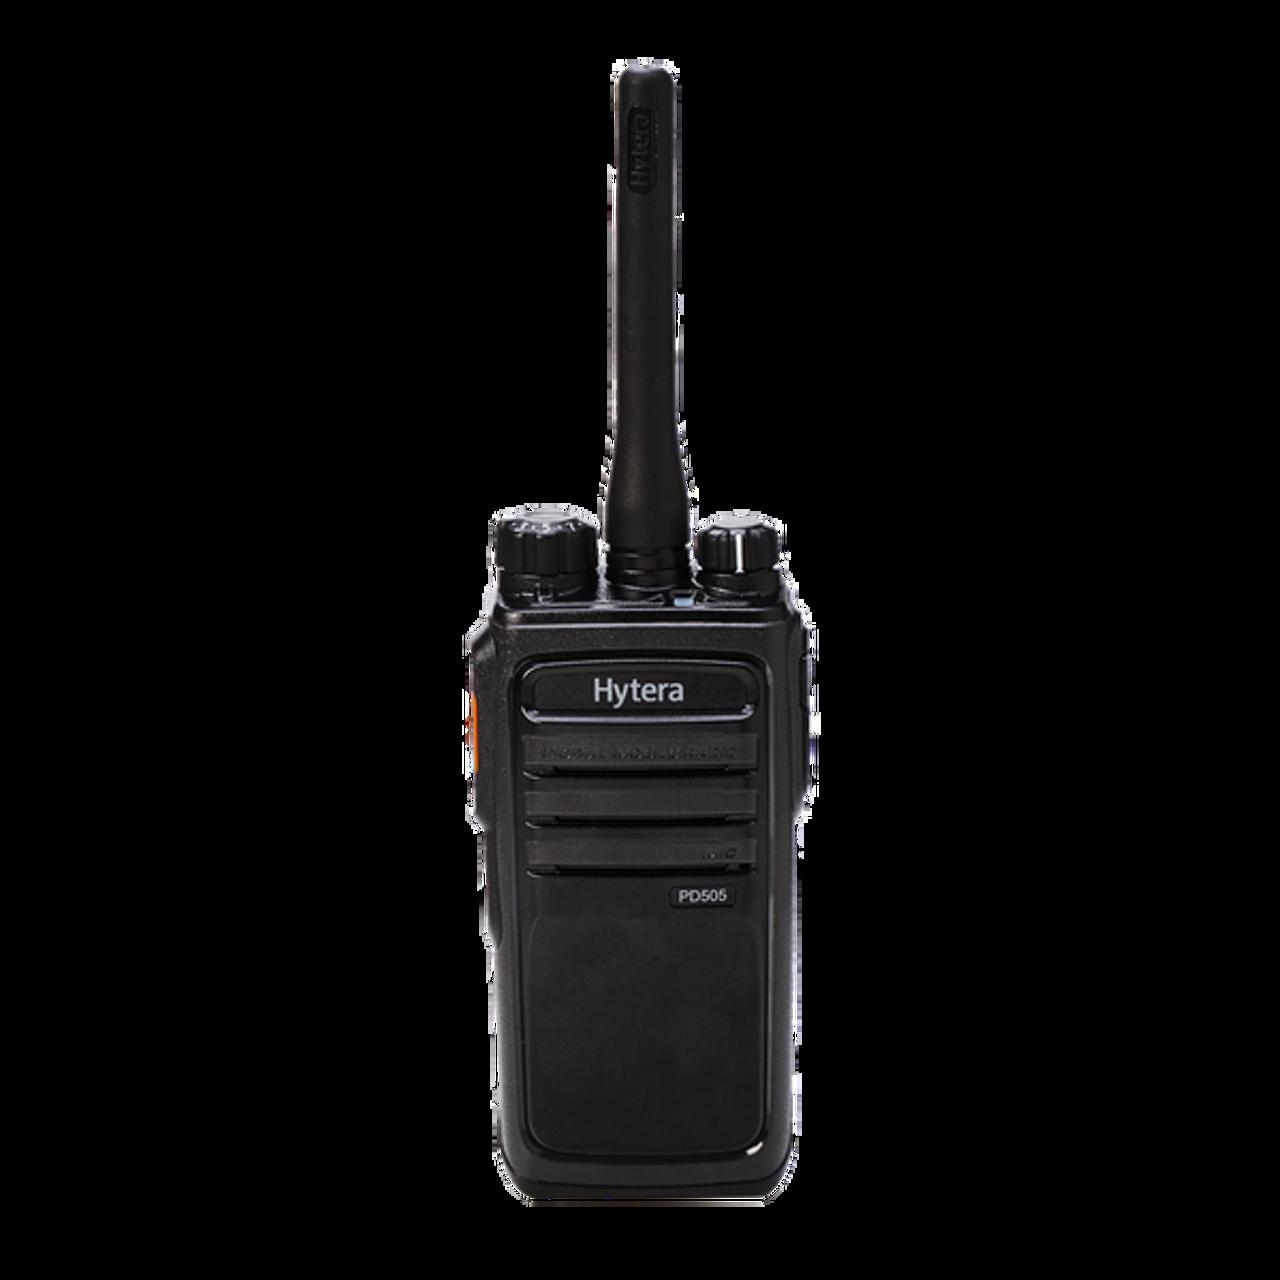 Hytera PD502i Digital Two Way Radio